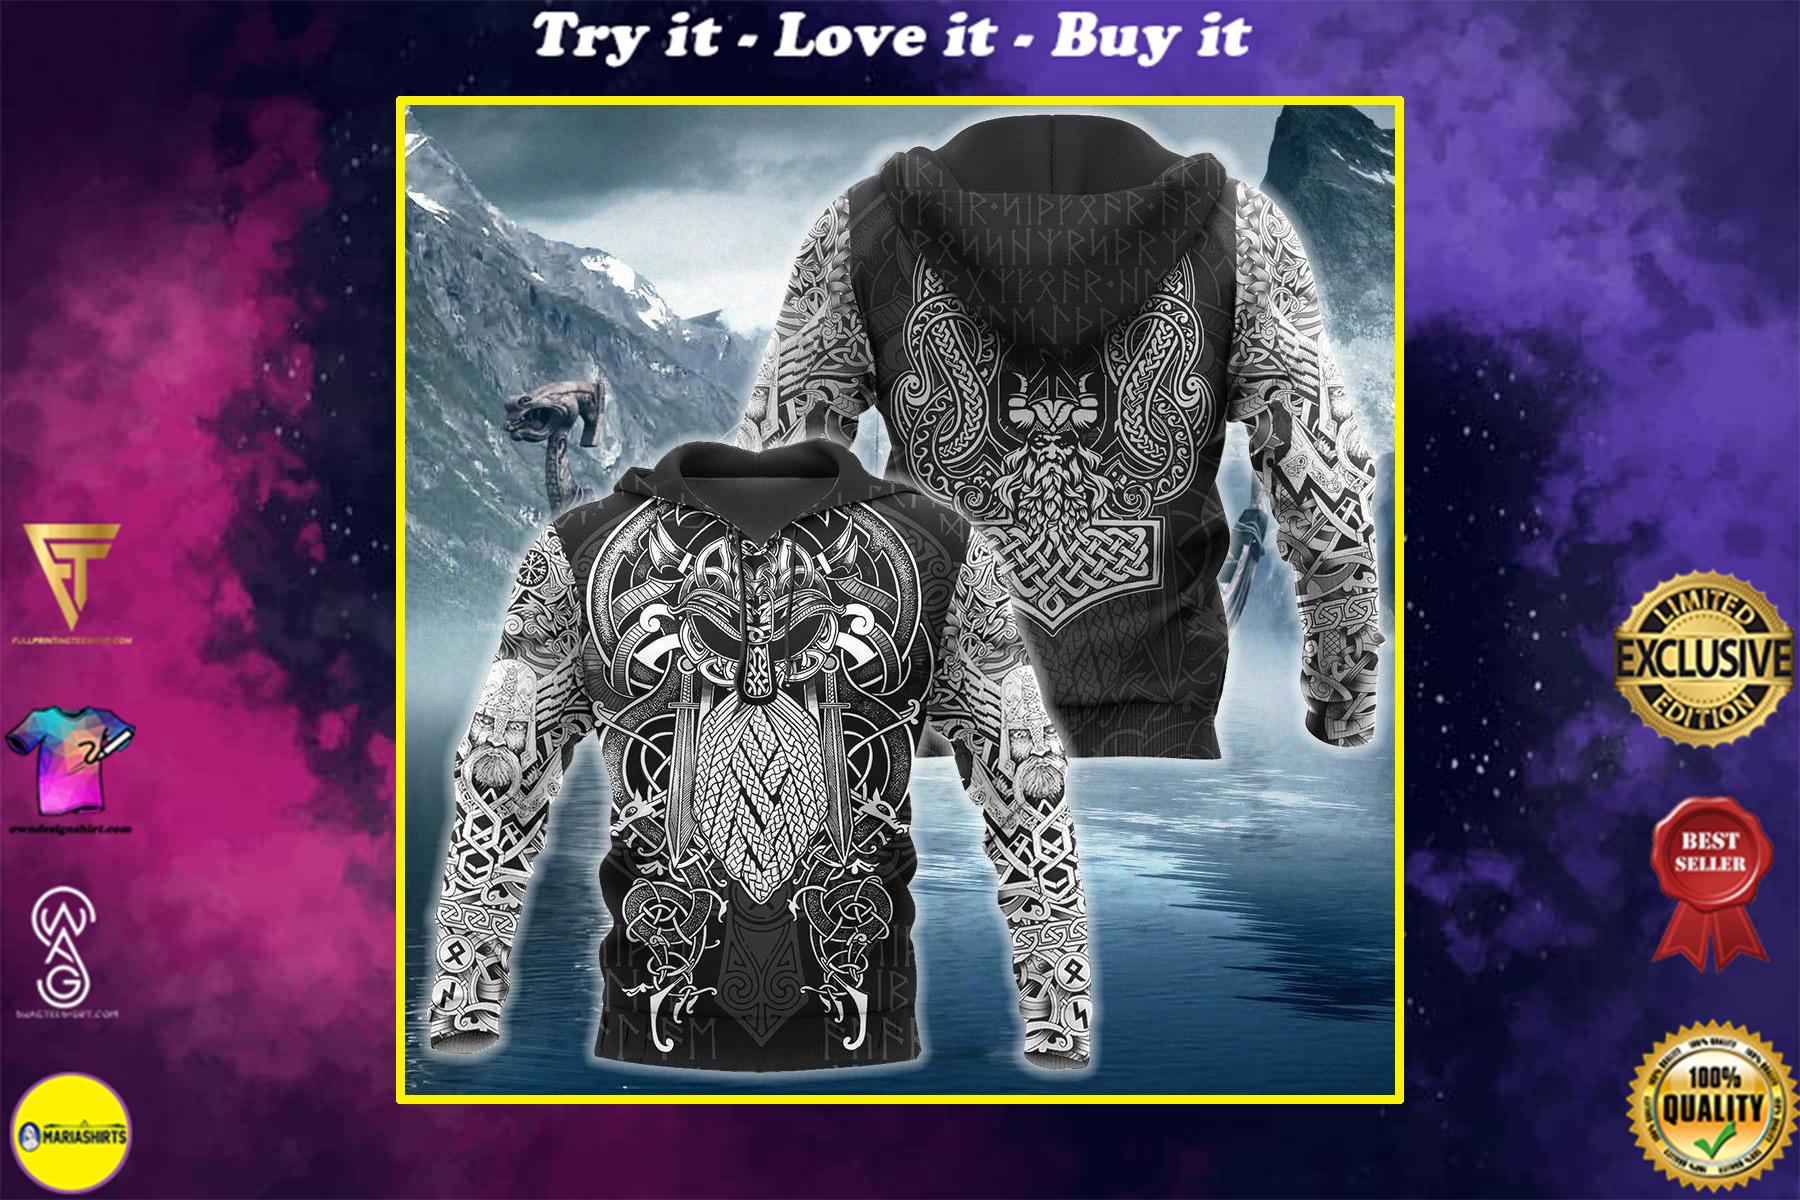 viking odin valhalla all over printed shirt